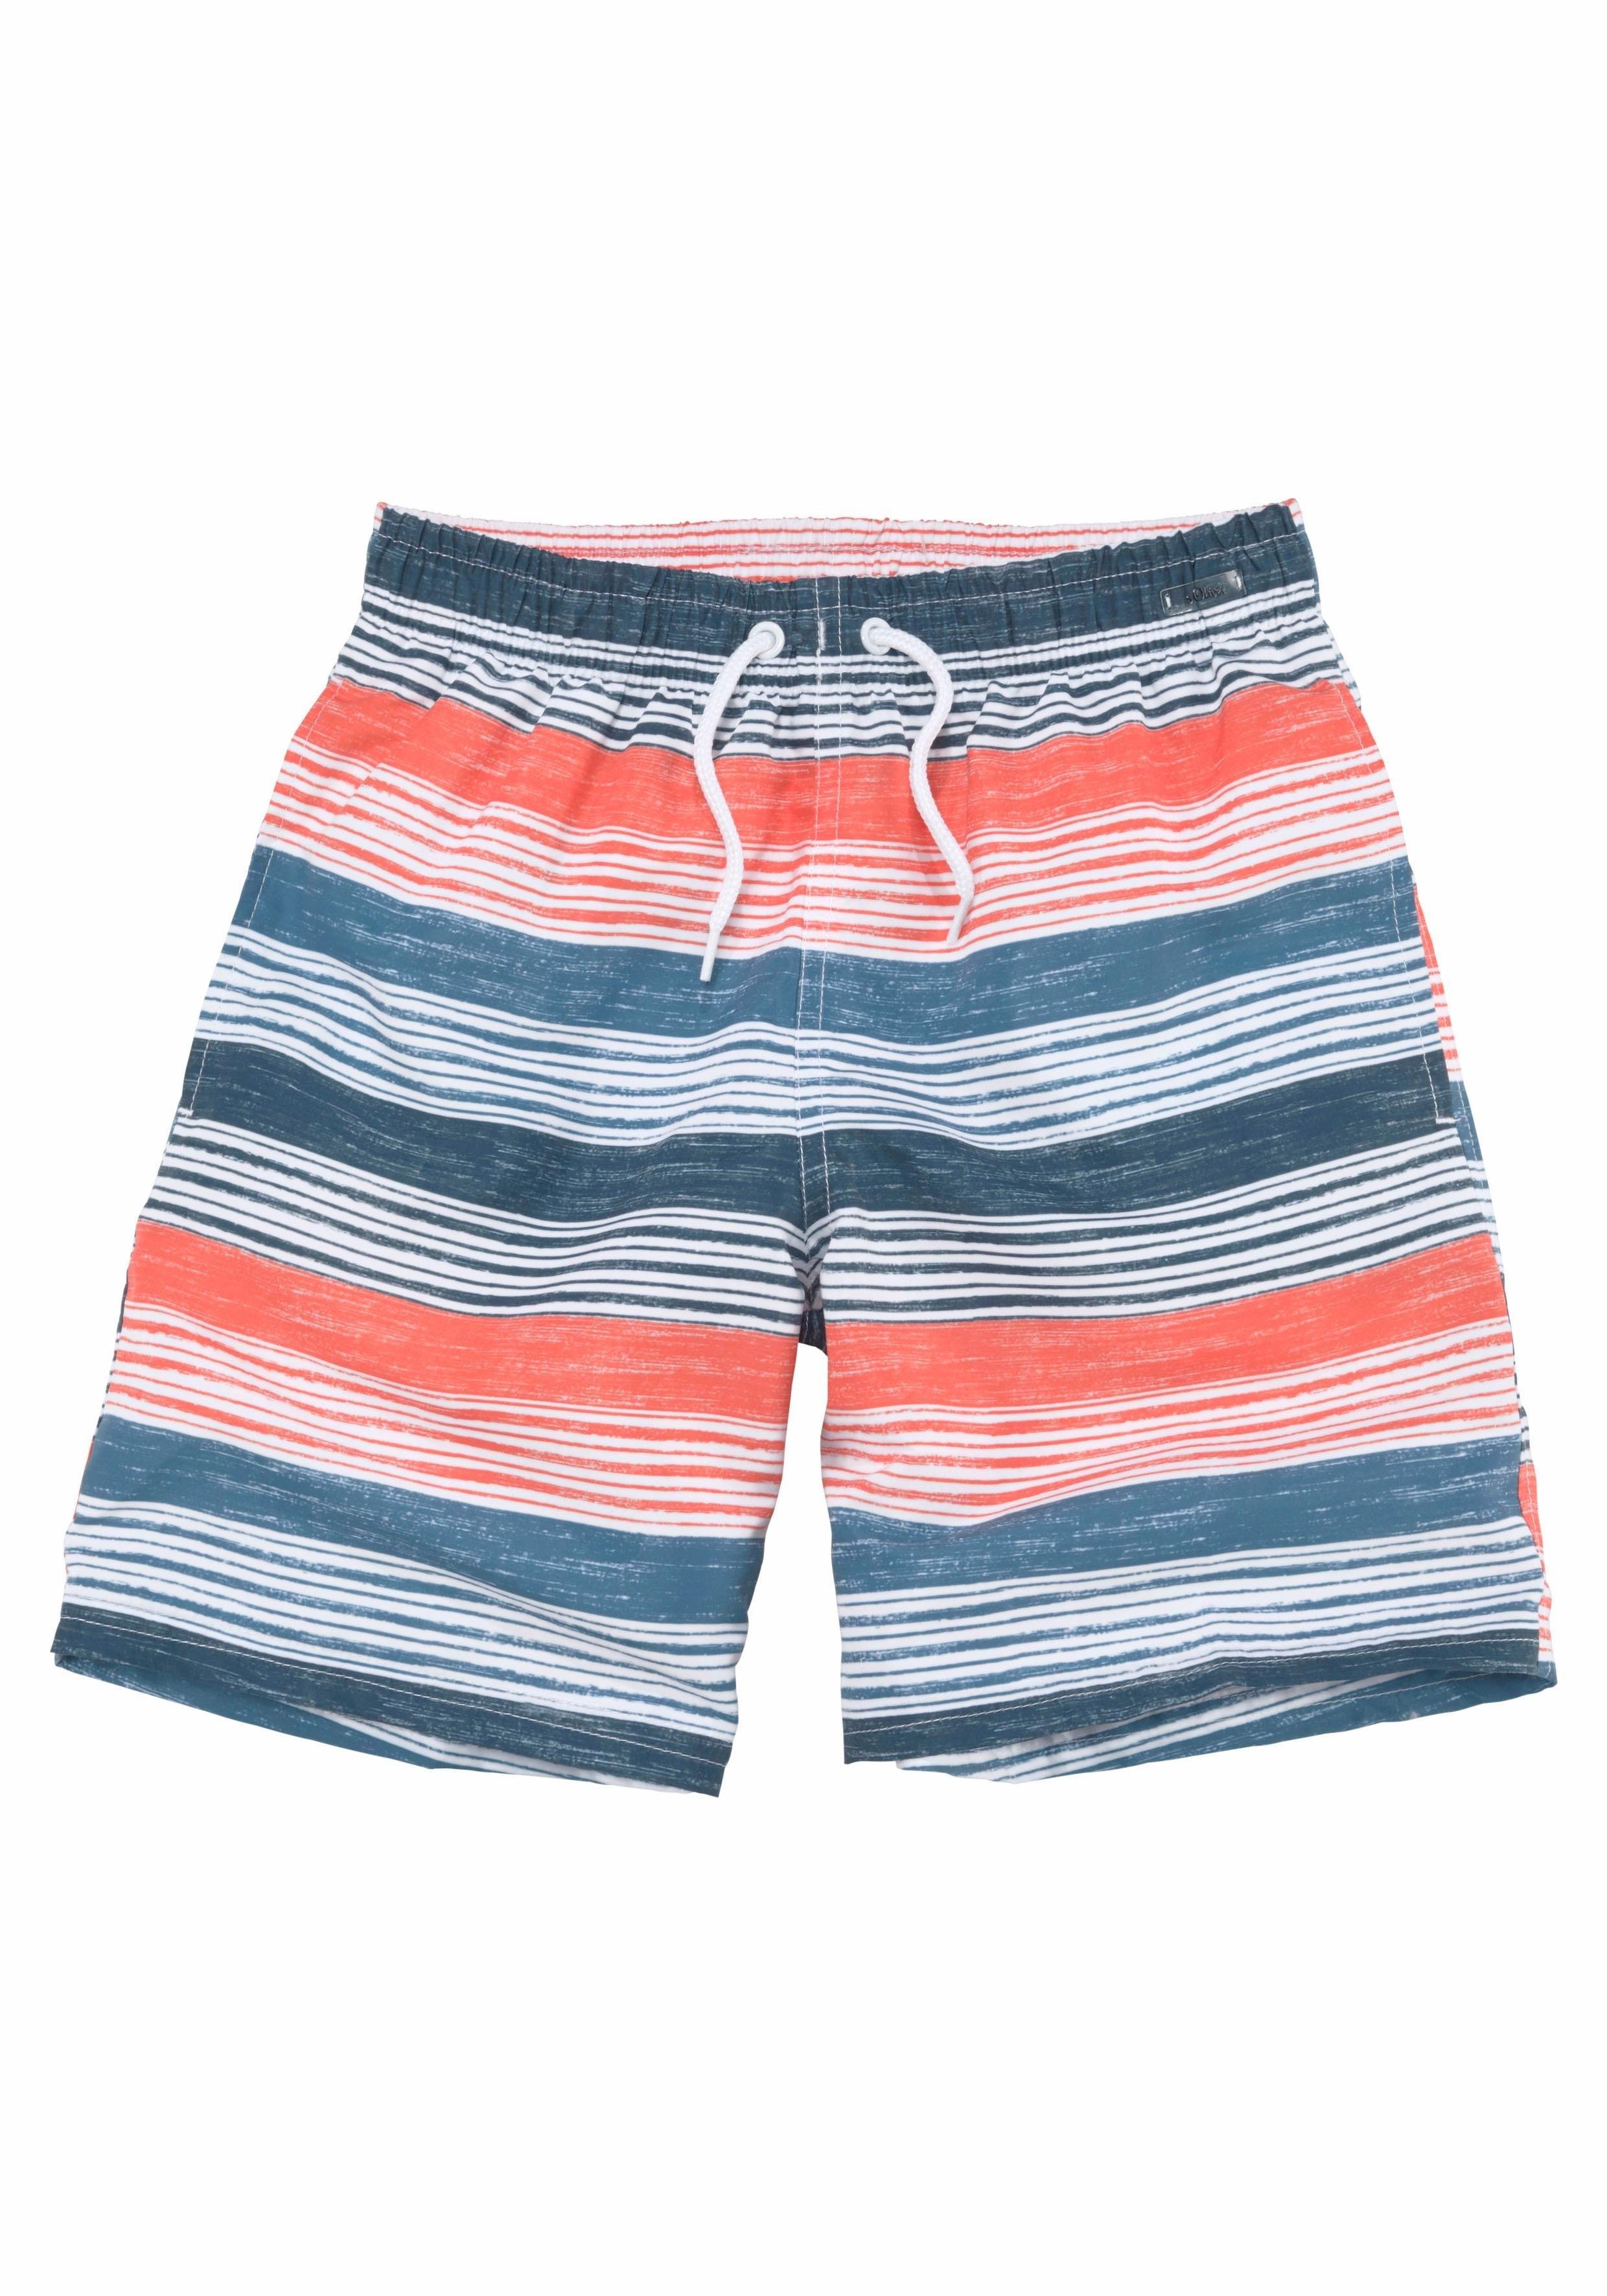 s.Oliver RED LABEL RED LABEL Beachwear zwemshort bestellen: 14 dagen bedenktijd